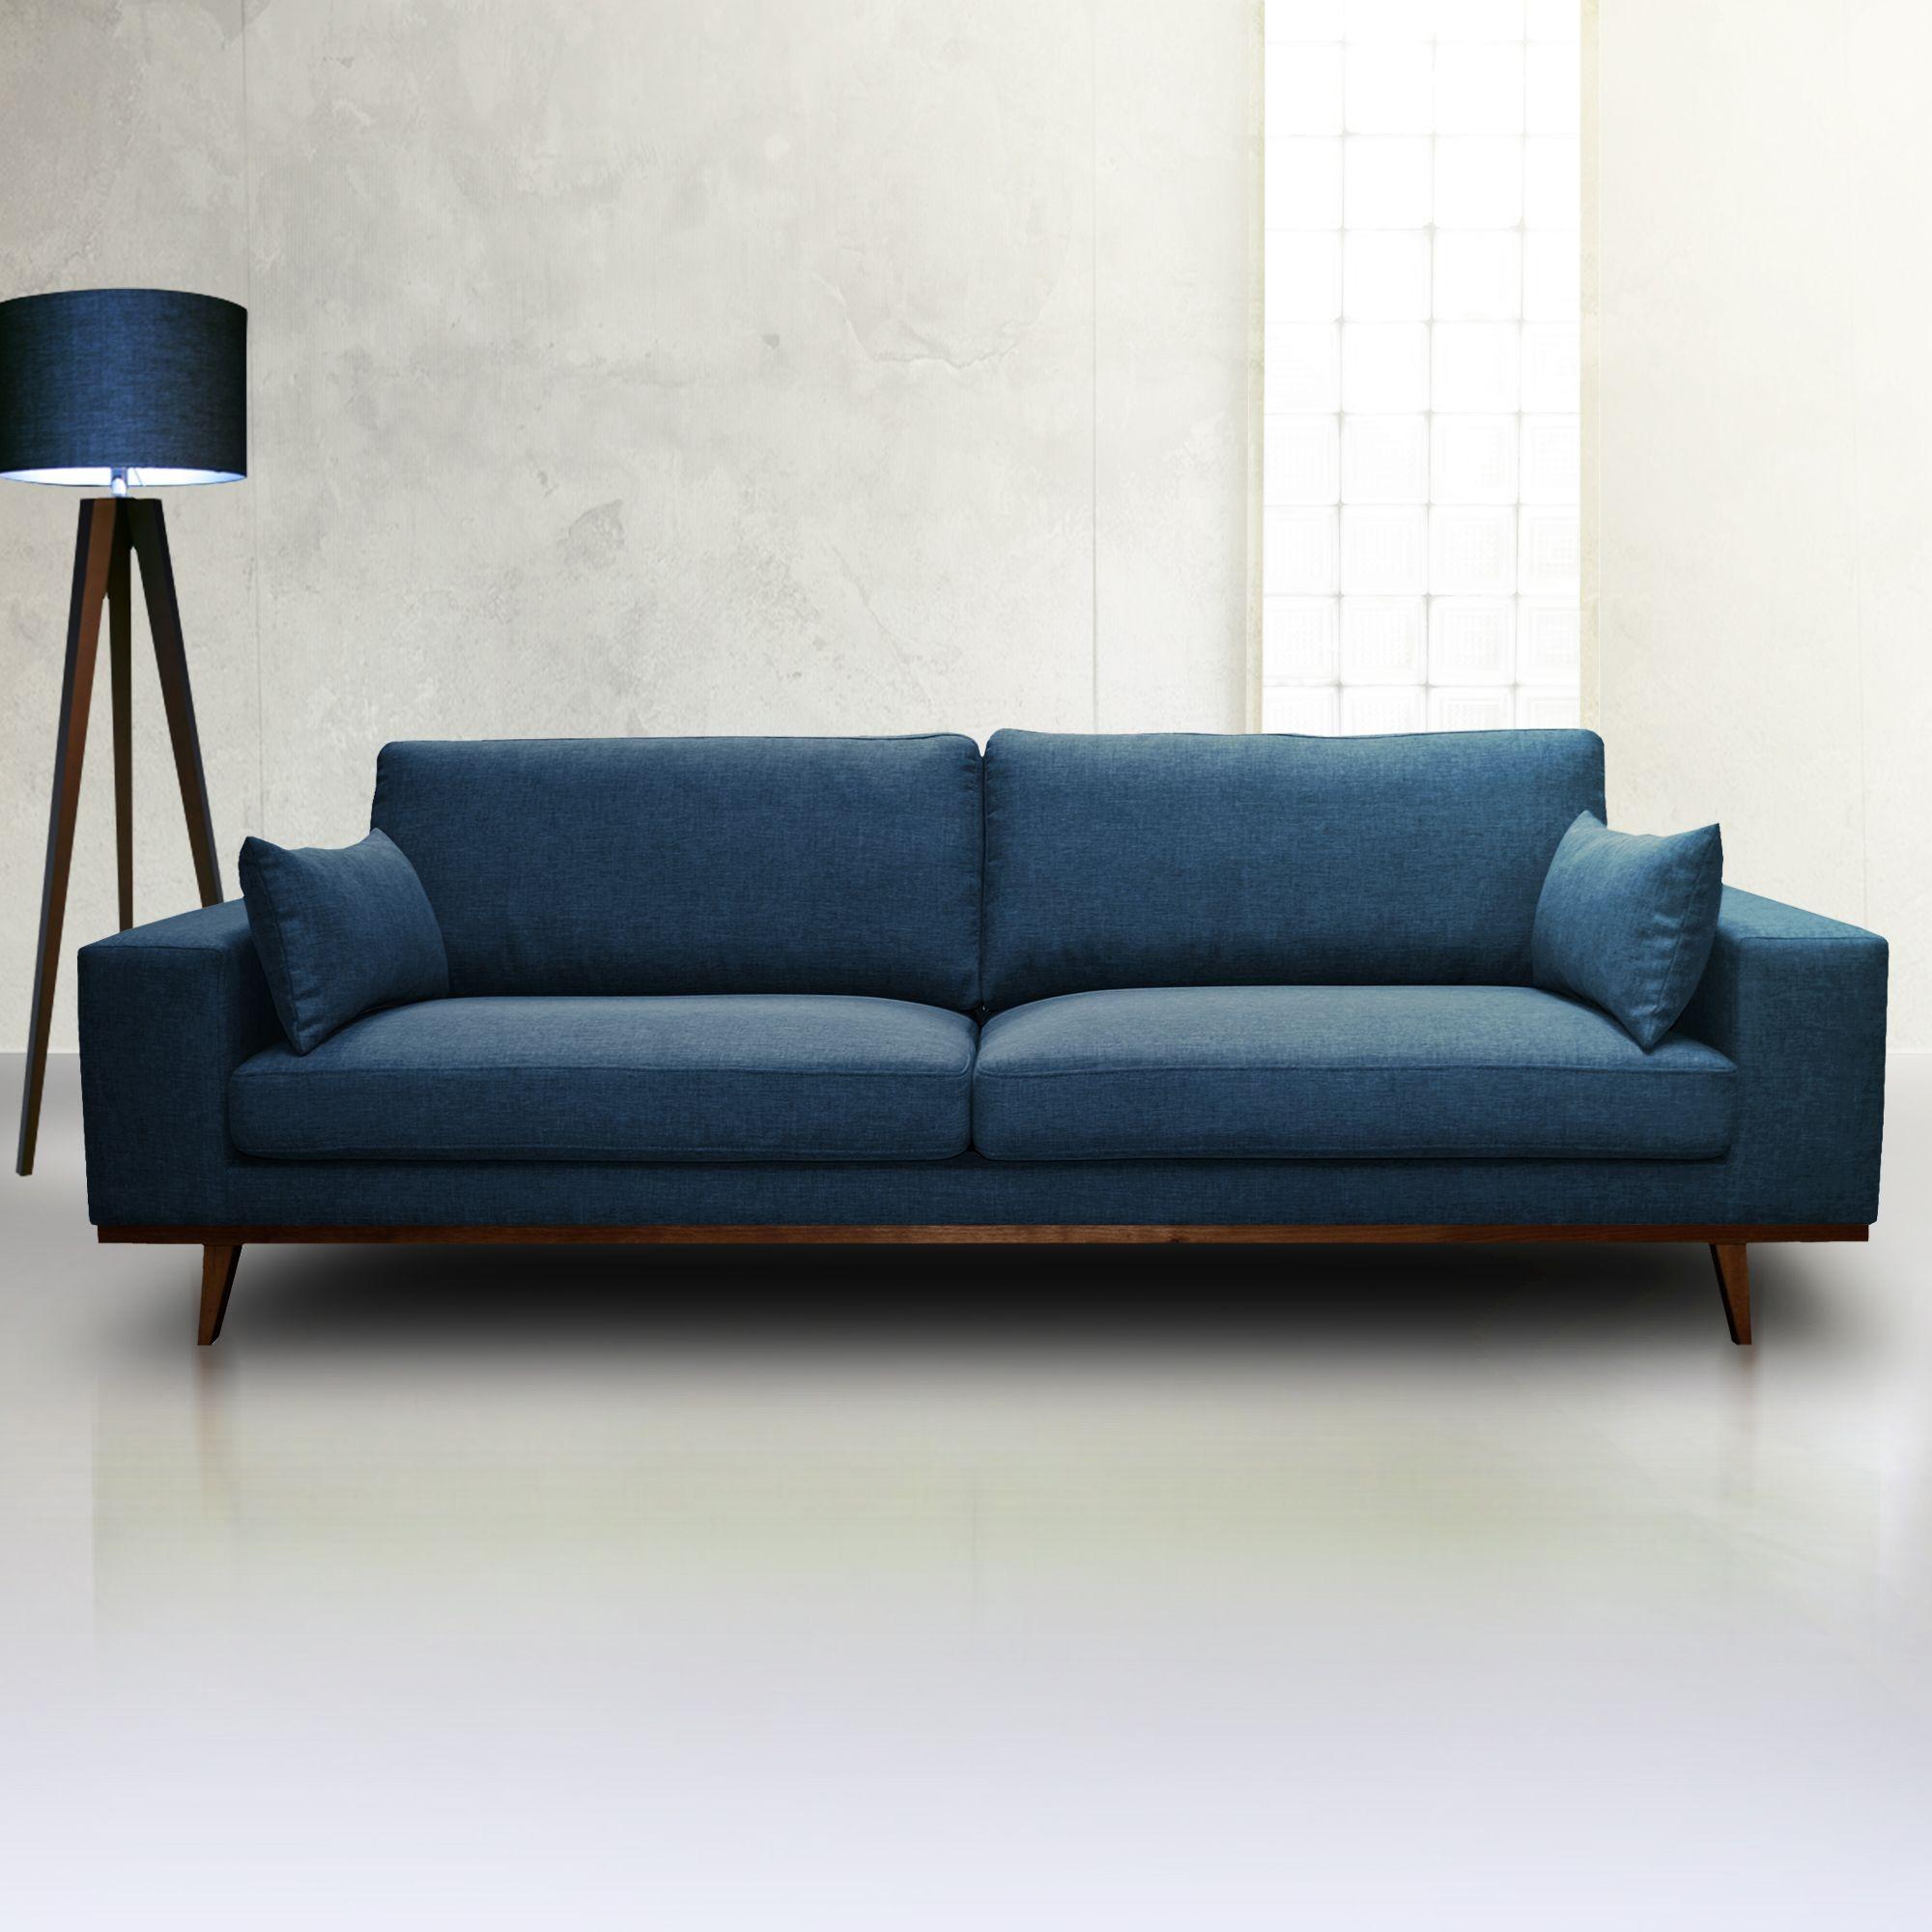 Canape D Angle Ikea Convertible Inspirant Photos Lit Armoire Canapé Beautiful Canap En U Convertible 12 Full Canape D